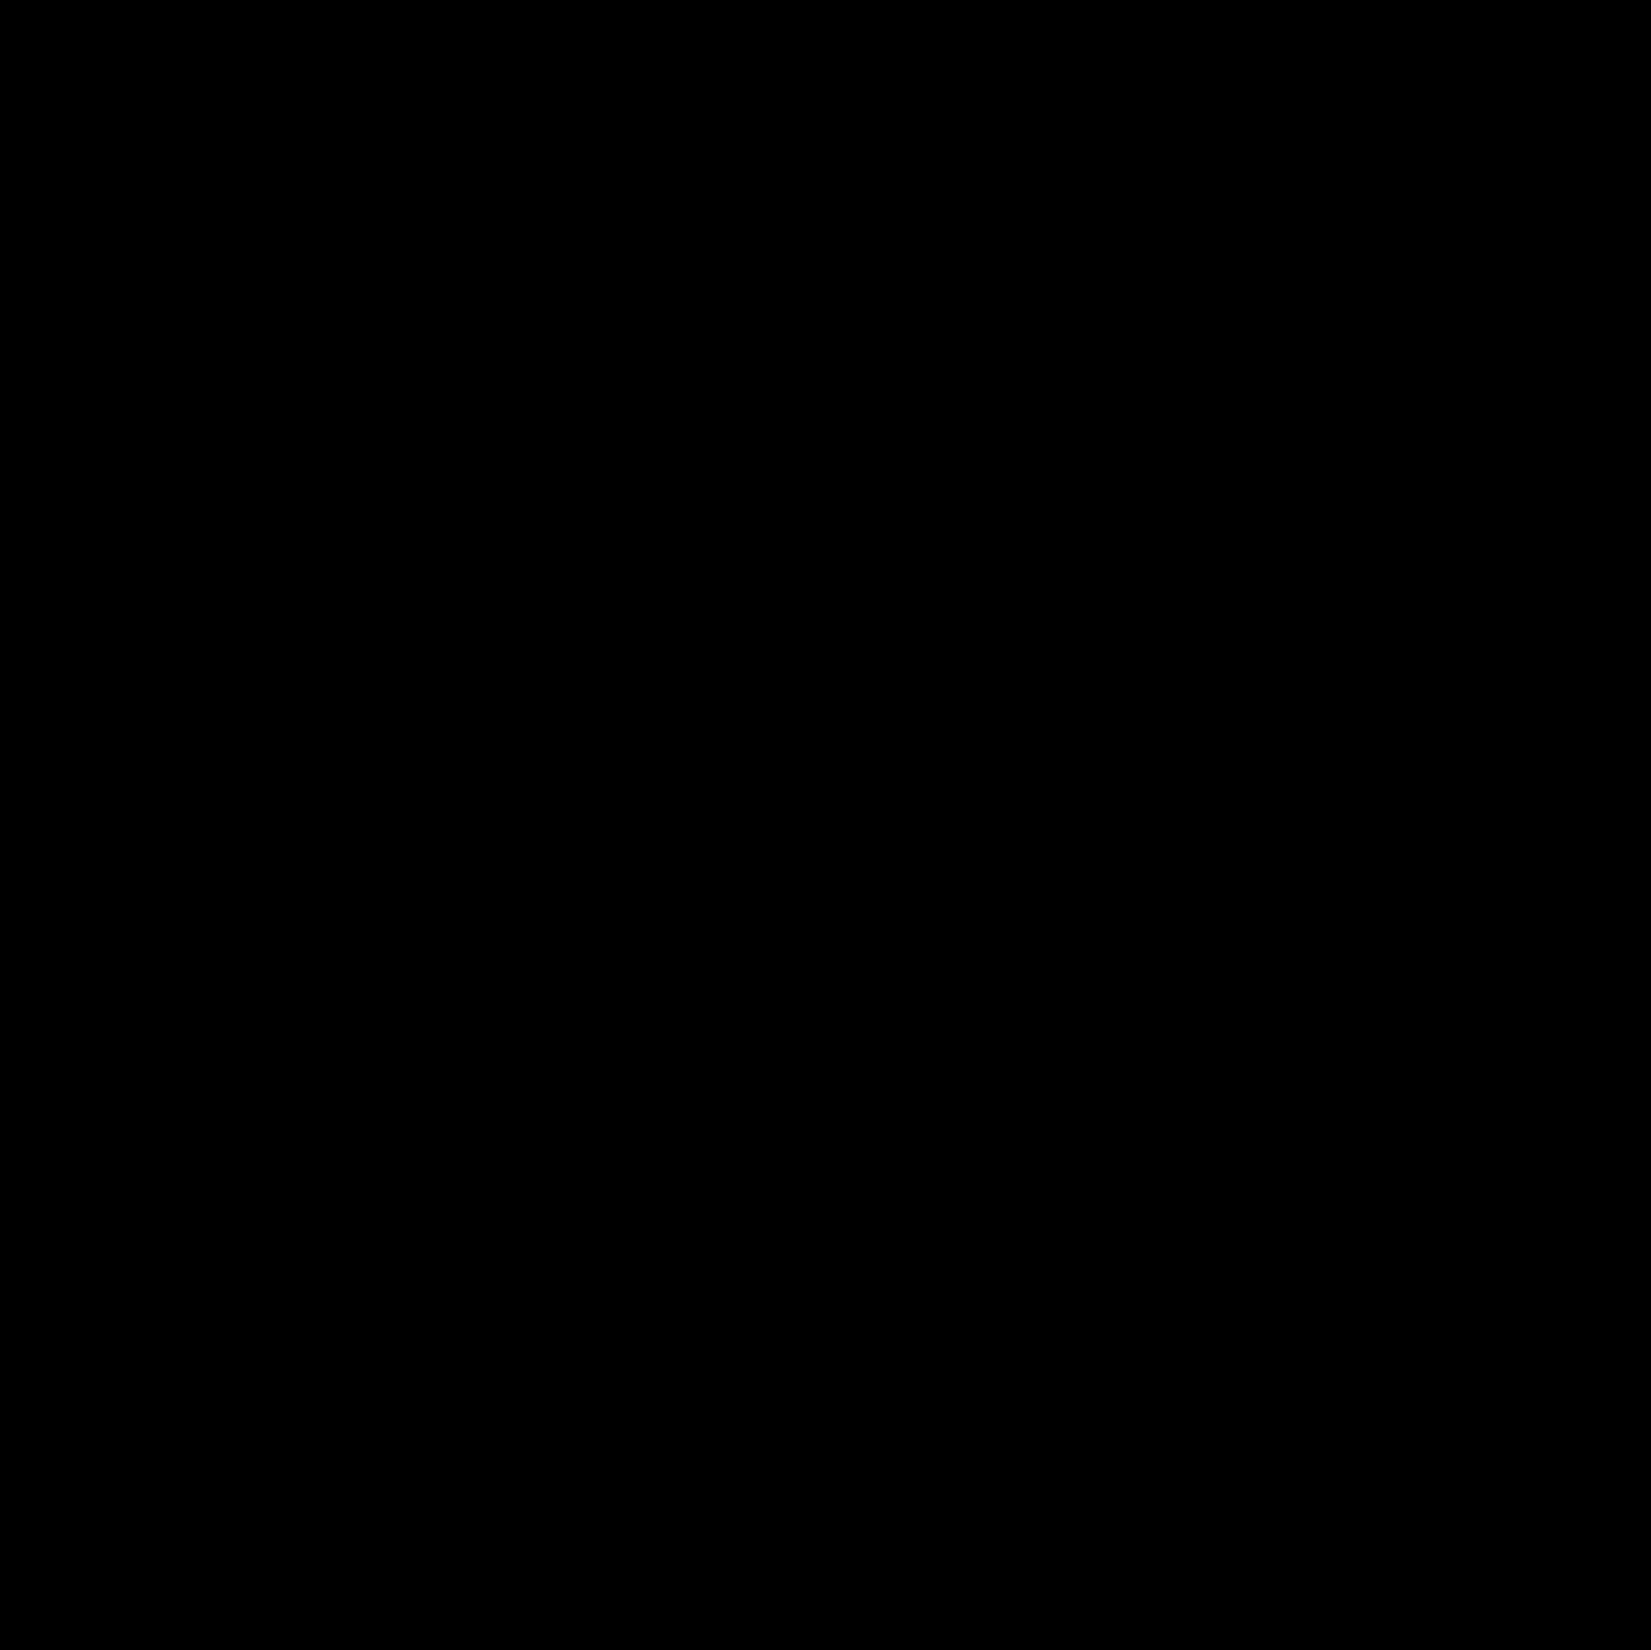 OYM_Black Fill Circle.png